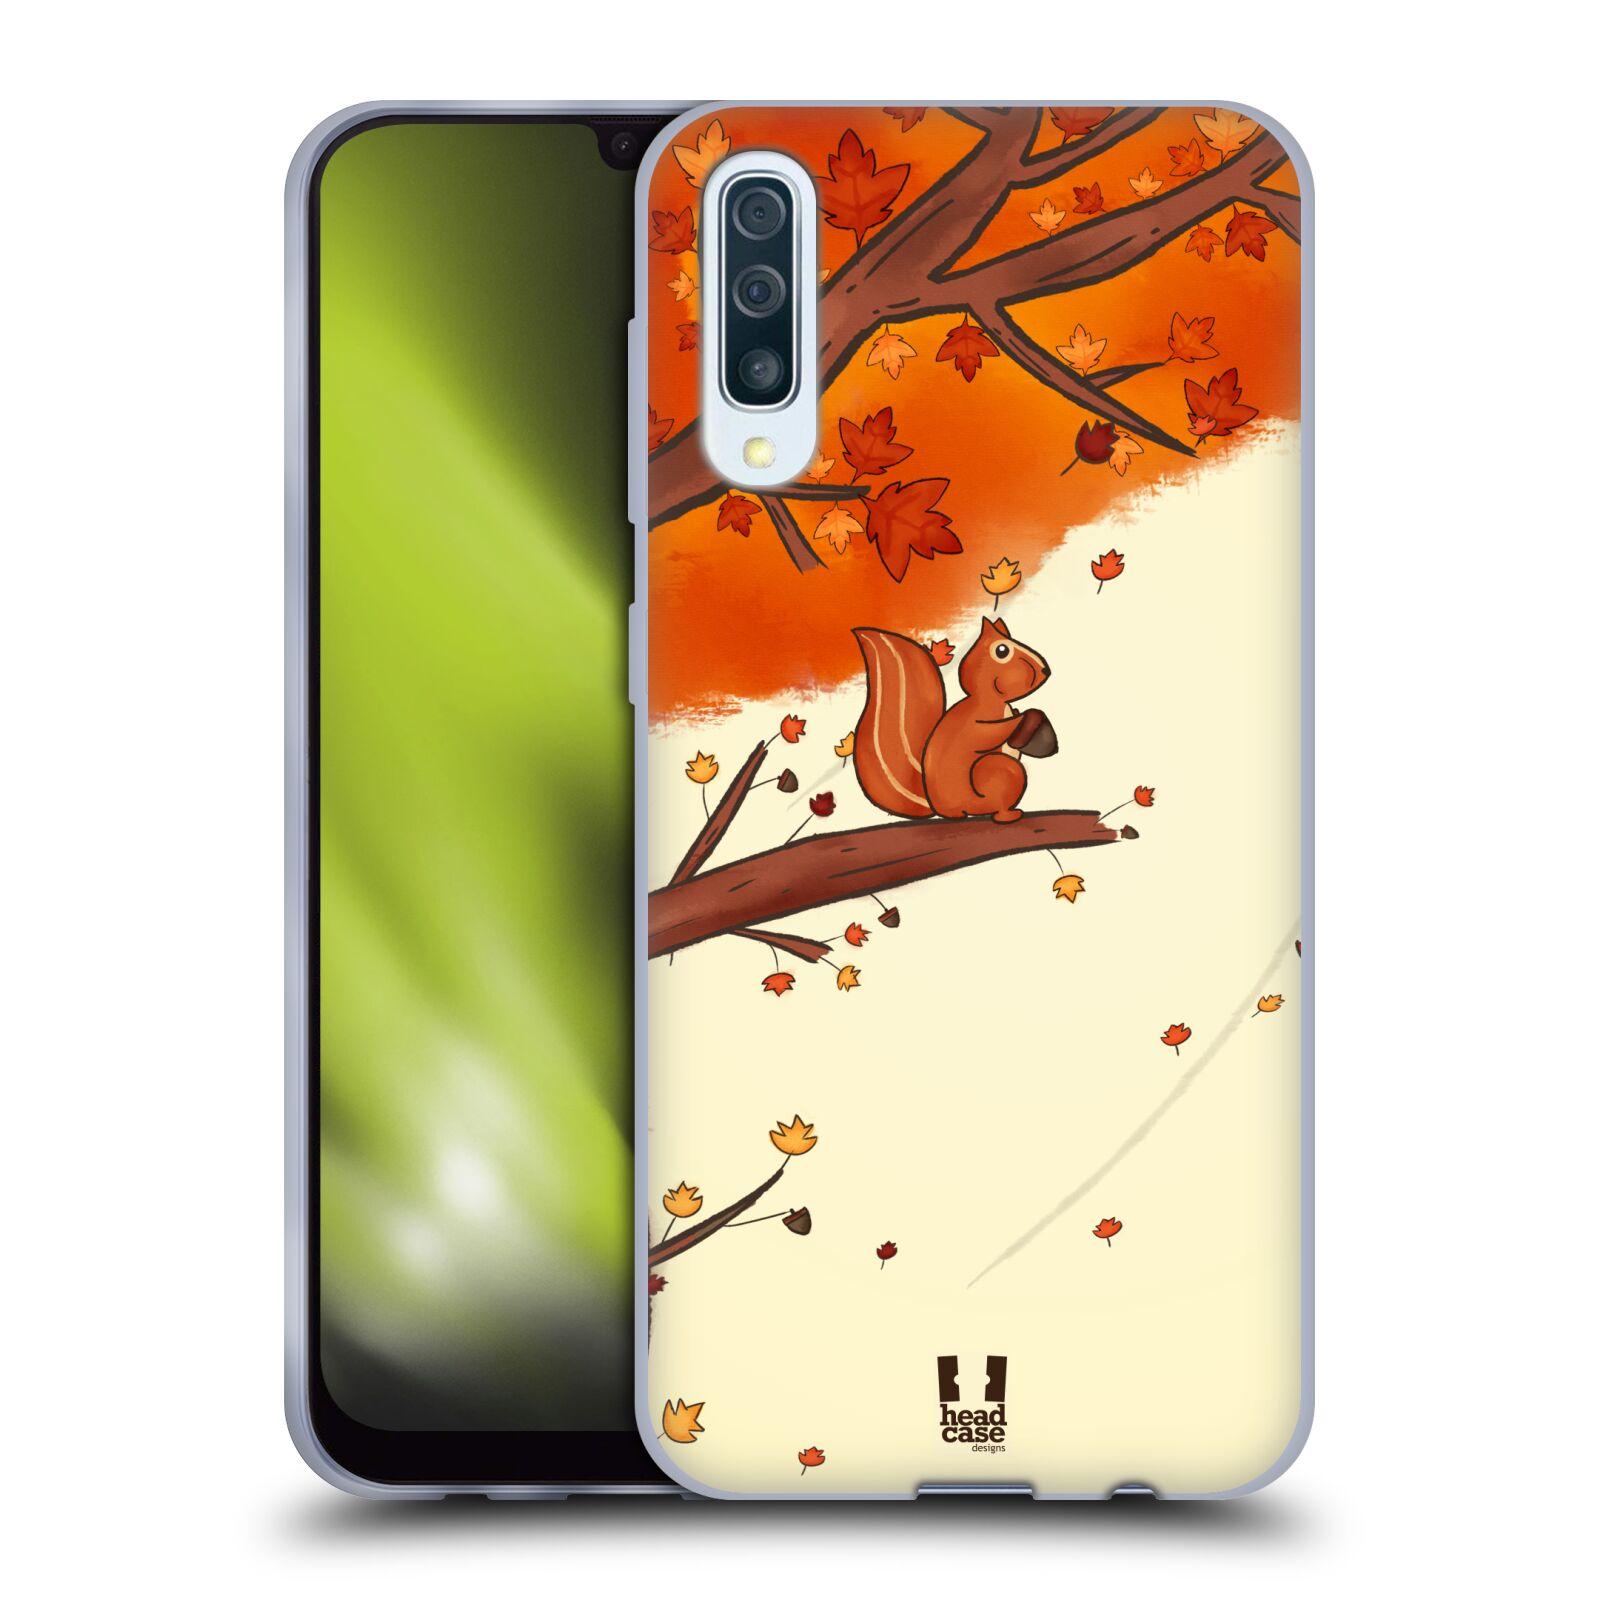 Silikonové pouzdro na mobil Samsung Galaxy A50 / A30s - Head Case - PODZIMNÍ VEVERKA